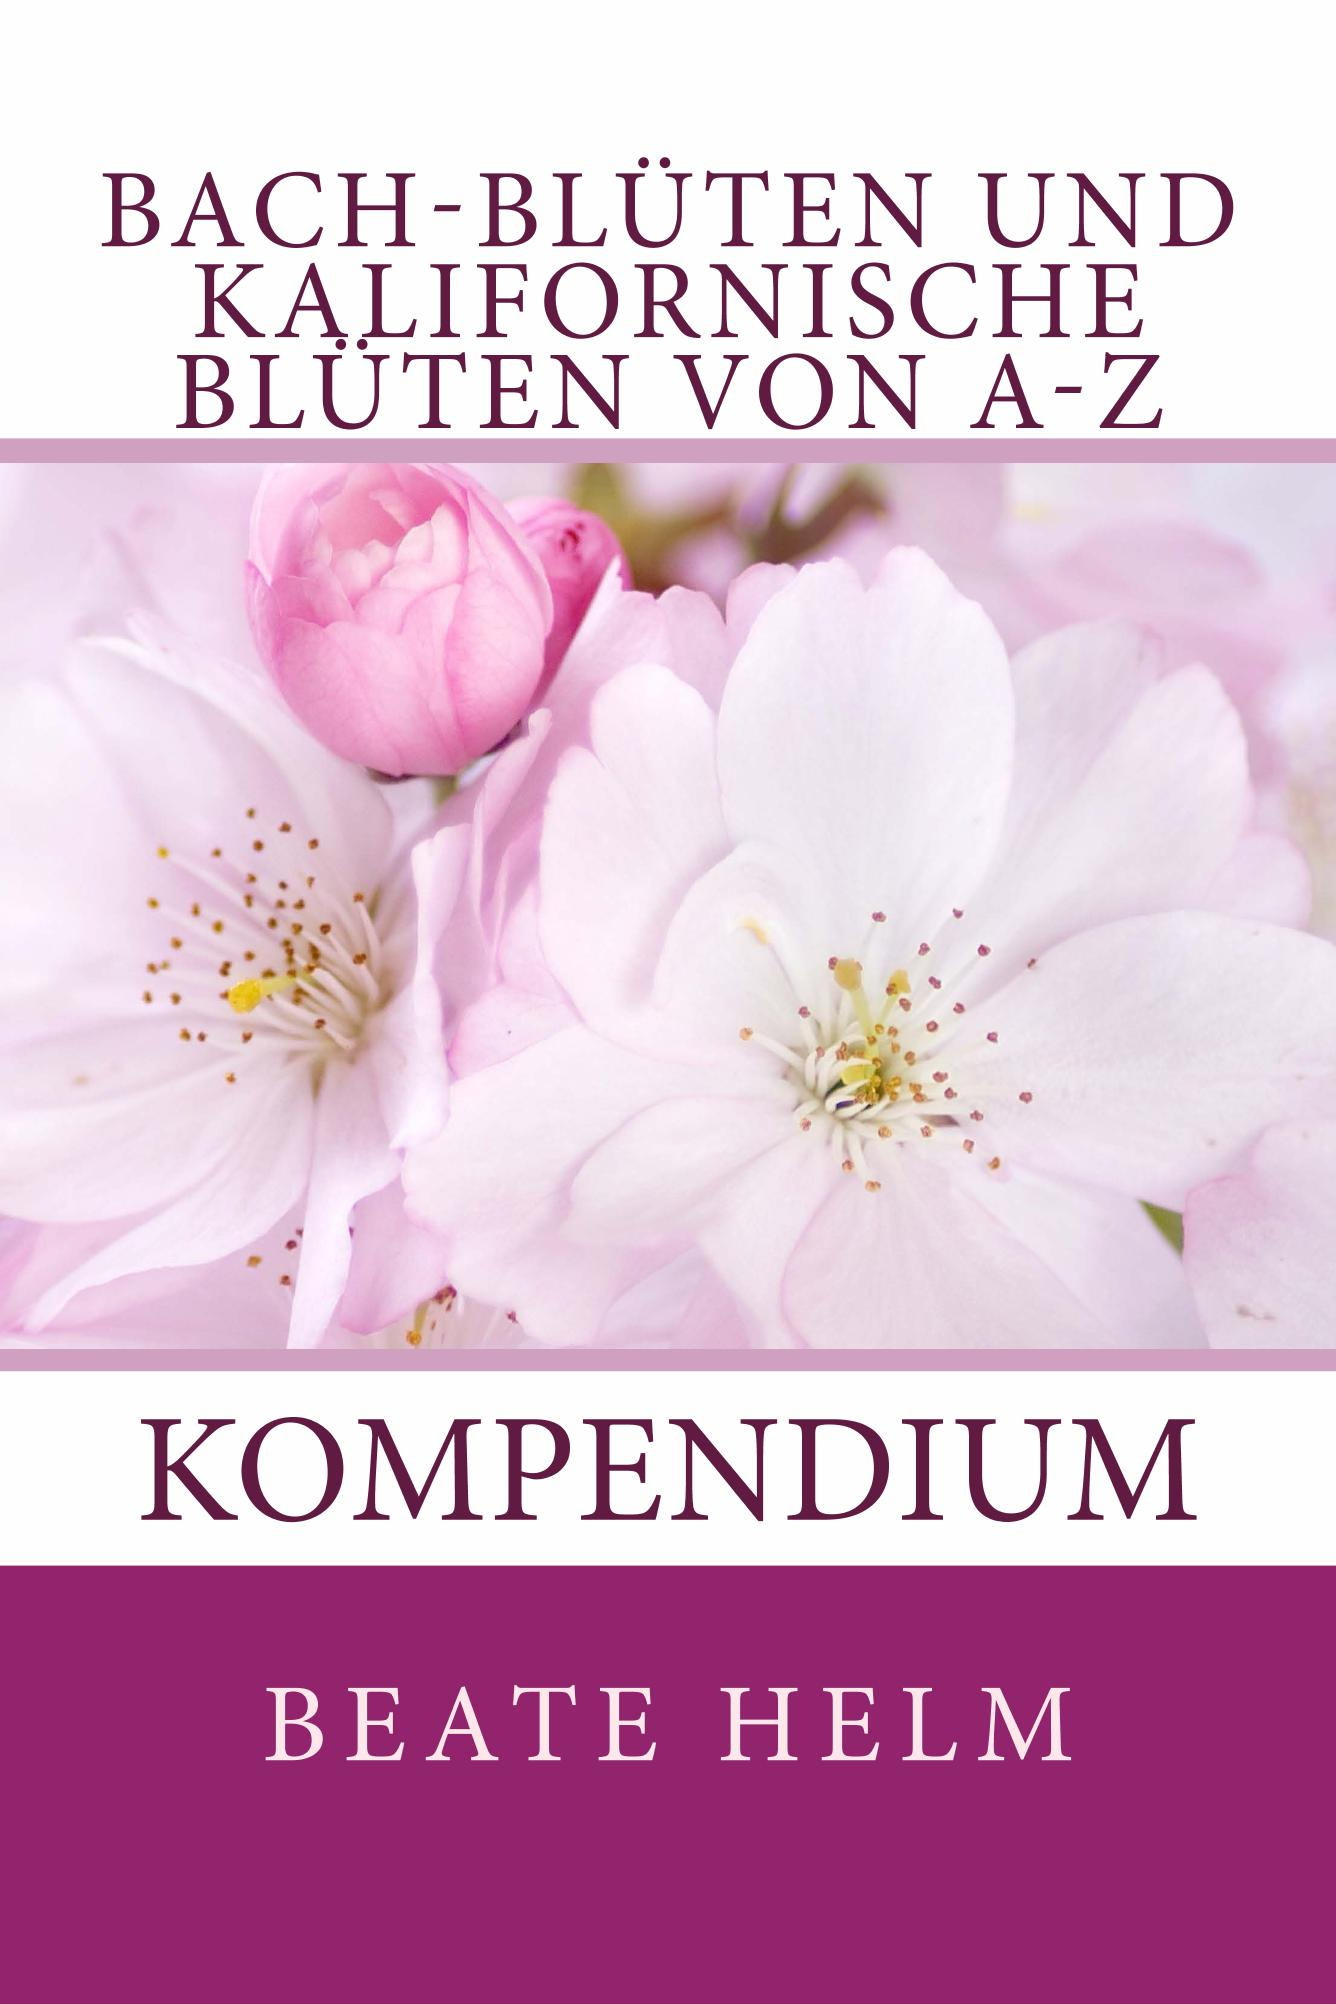 Blüten Kompendium cover